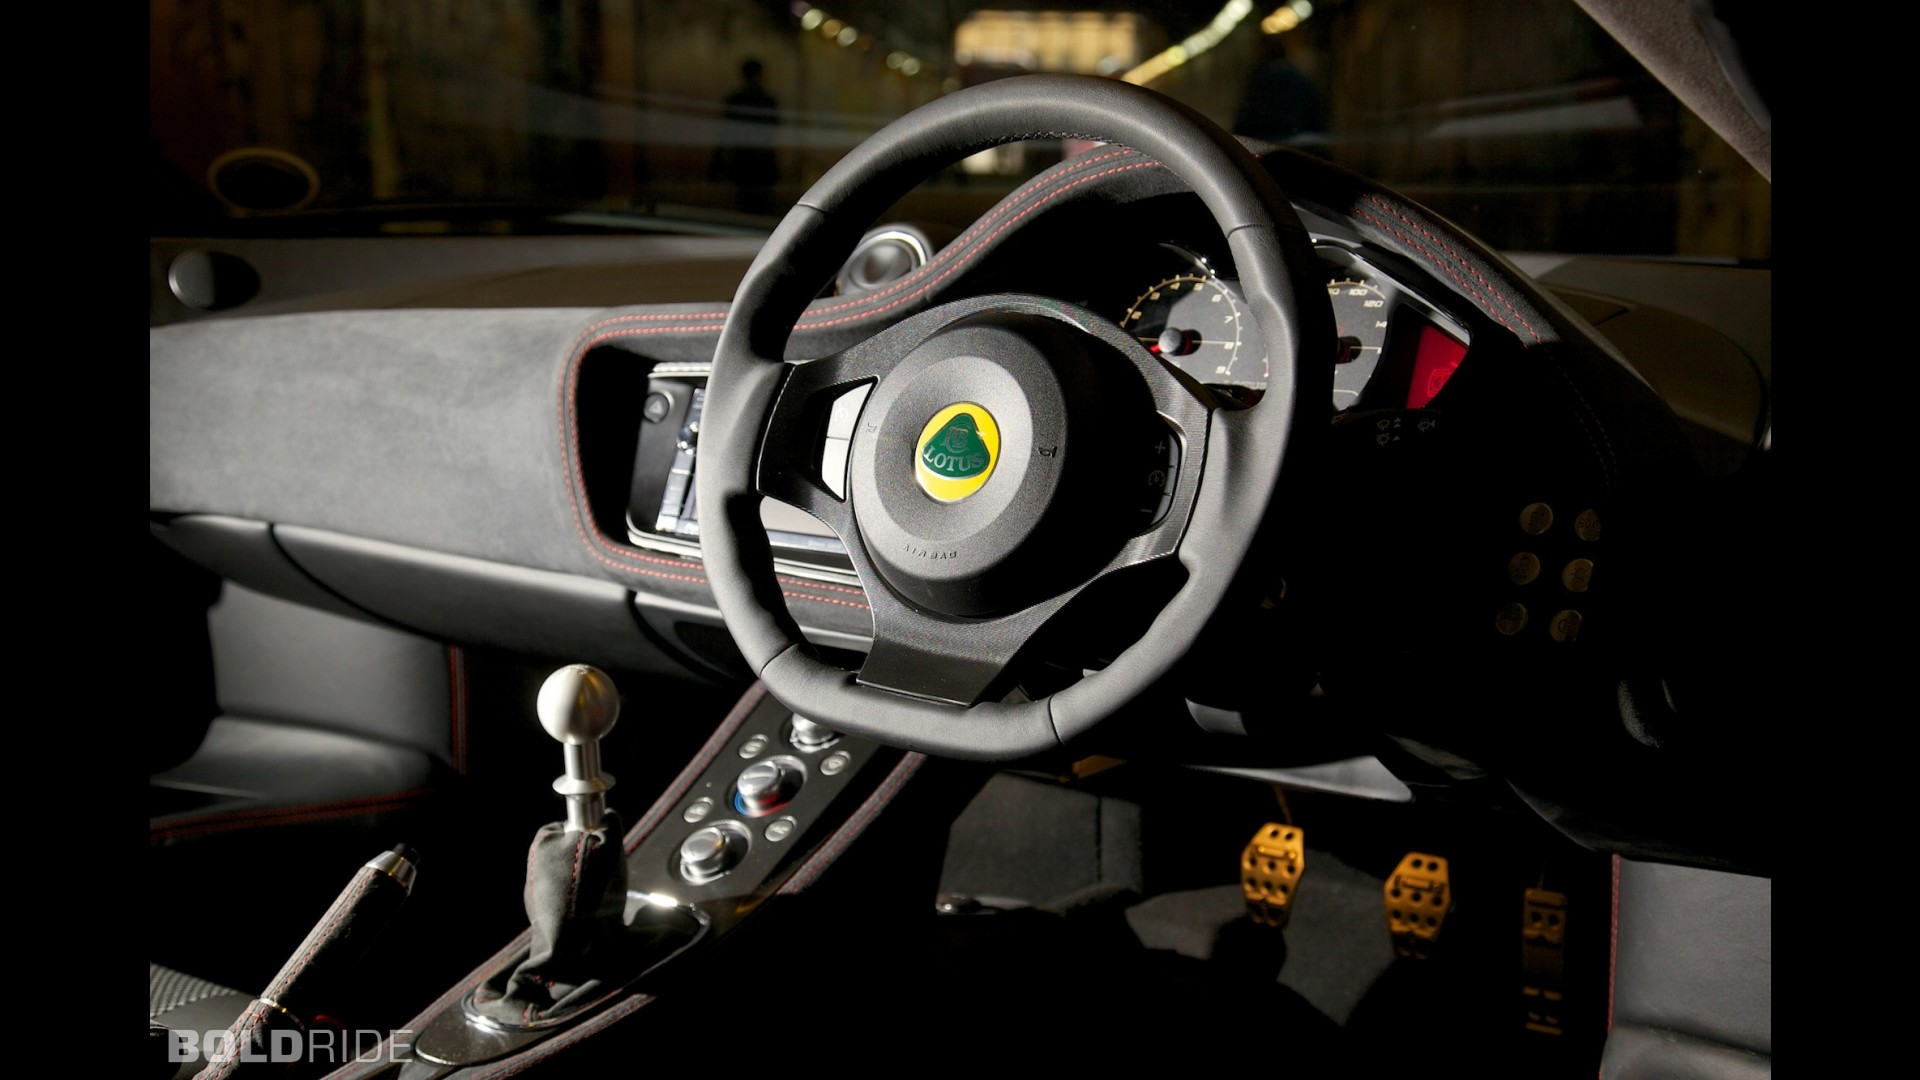 https://icdn-8.motor1.com/images/mgl/NVwPG/s1/lotus-evora-sports-racer.jpg